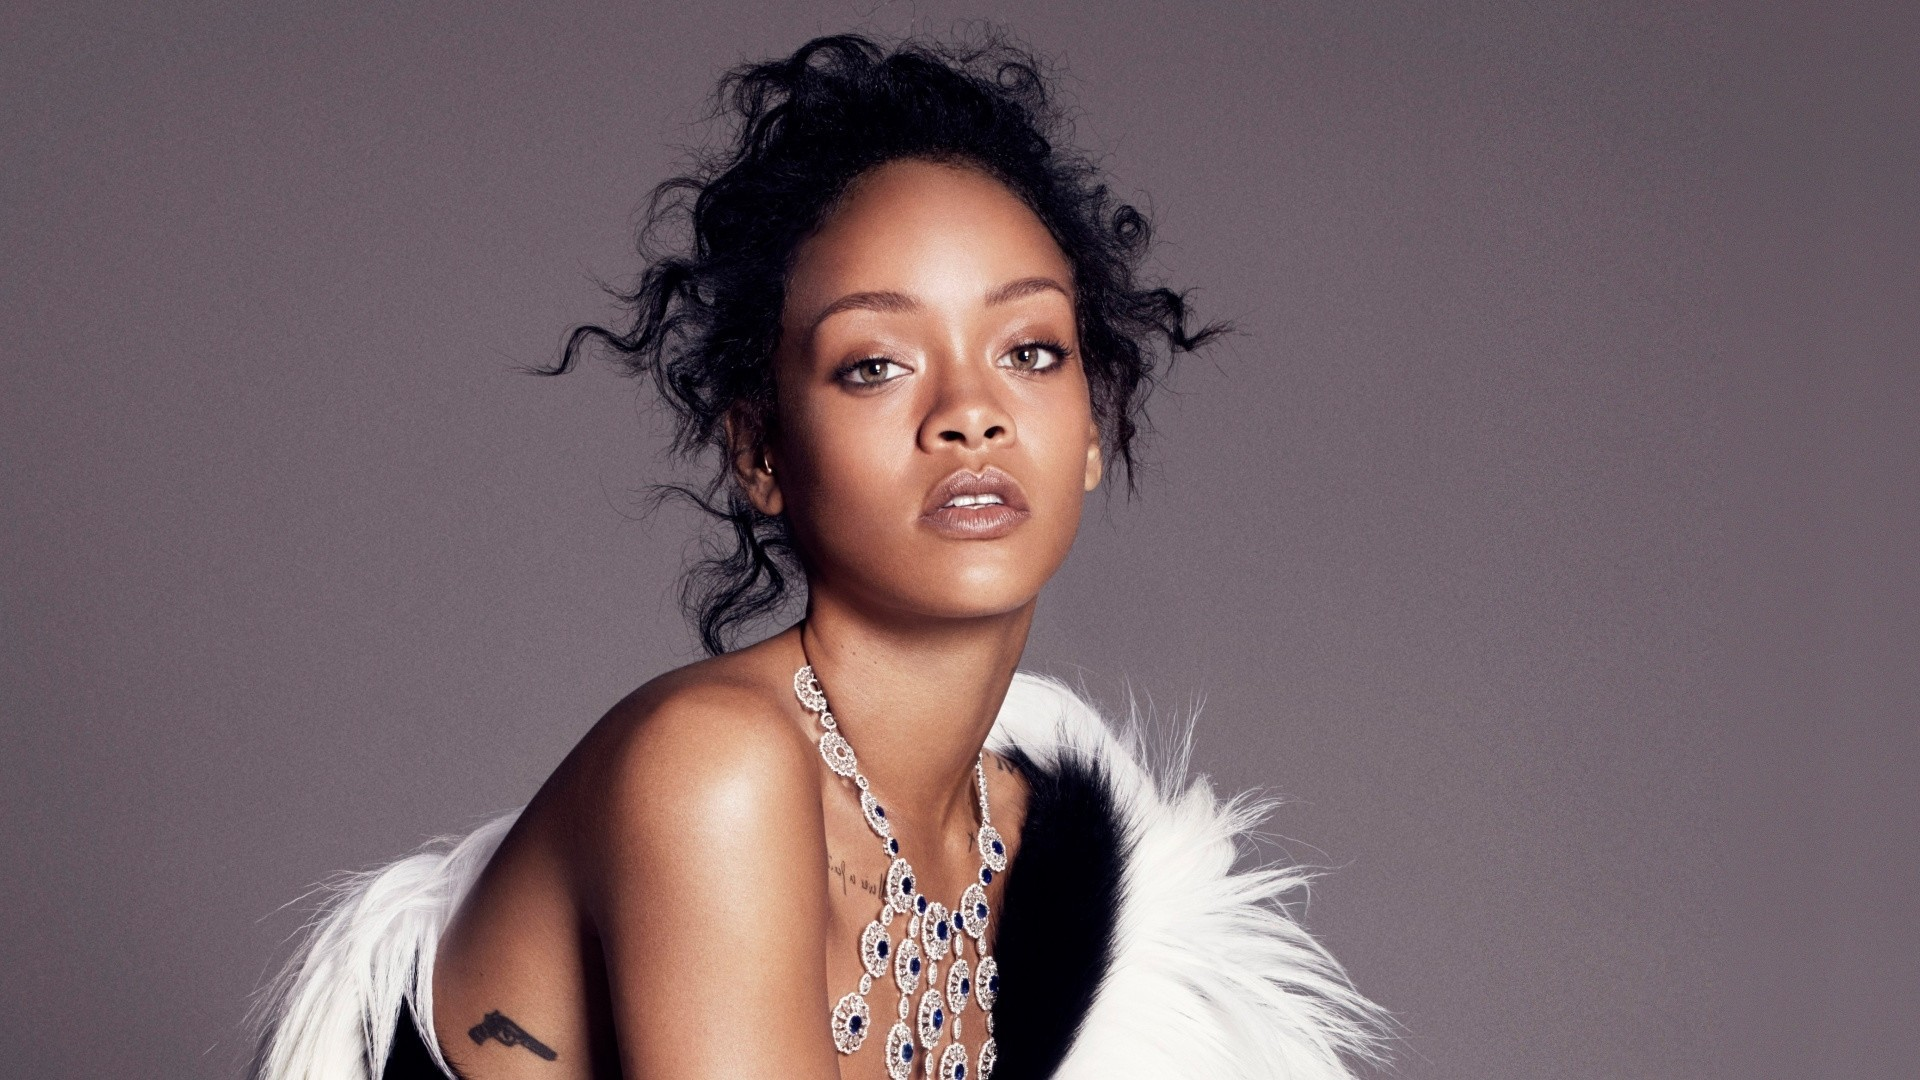 Rihanna Wallpaper Picture hd